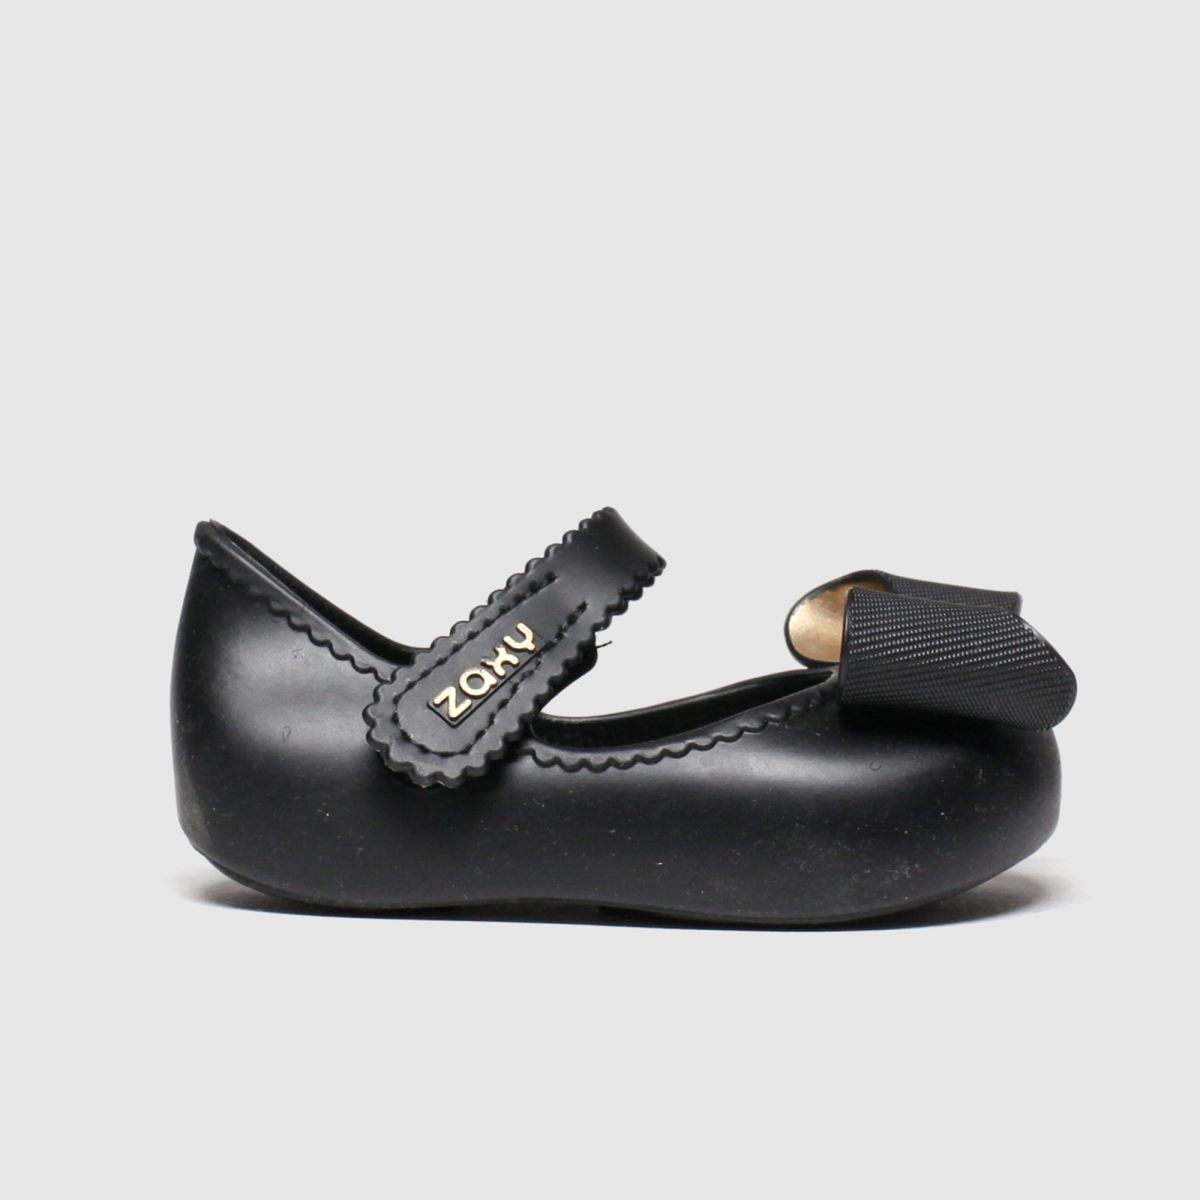 Zaxy Zaxy Black Baby Classic Bow Shoes Toddler